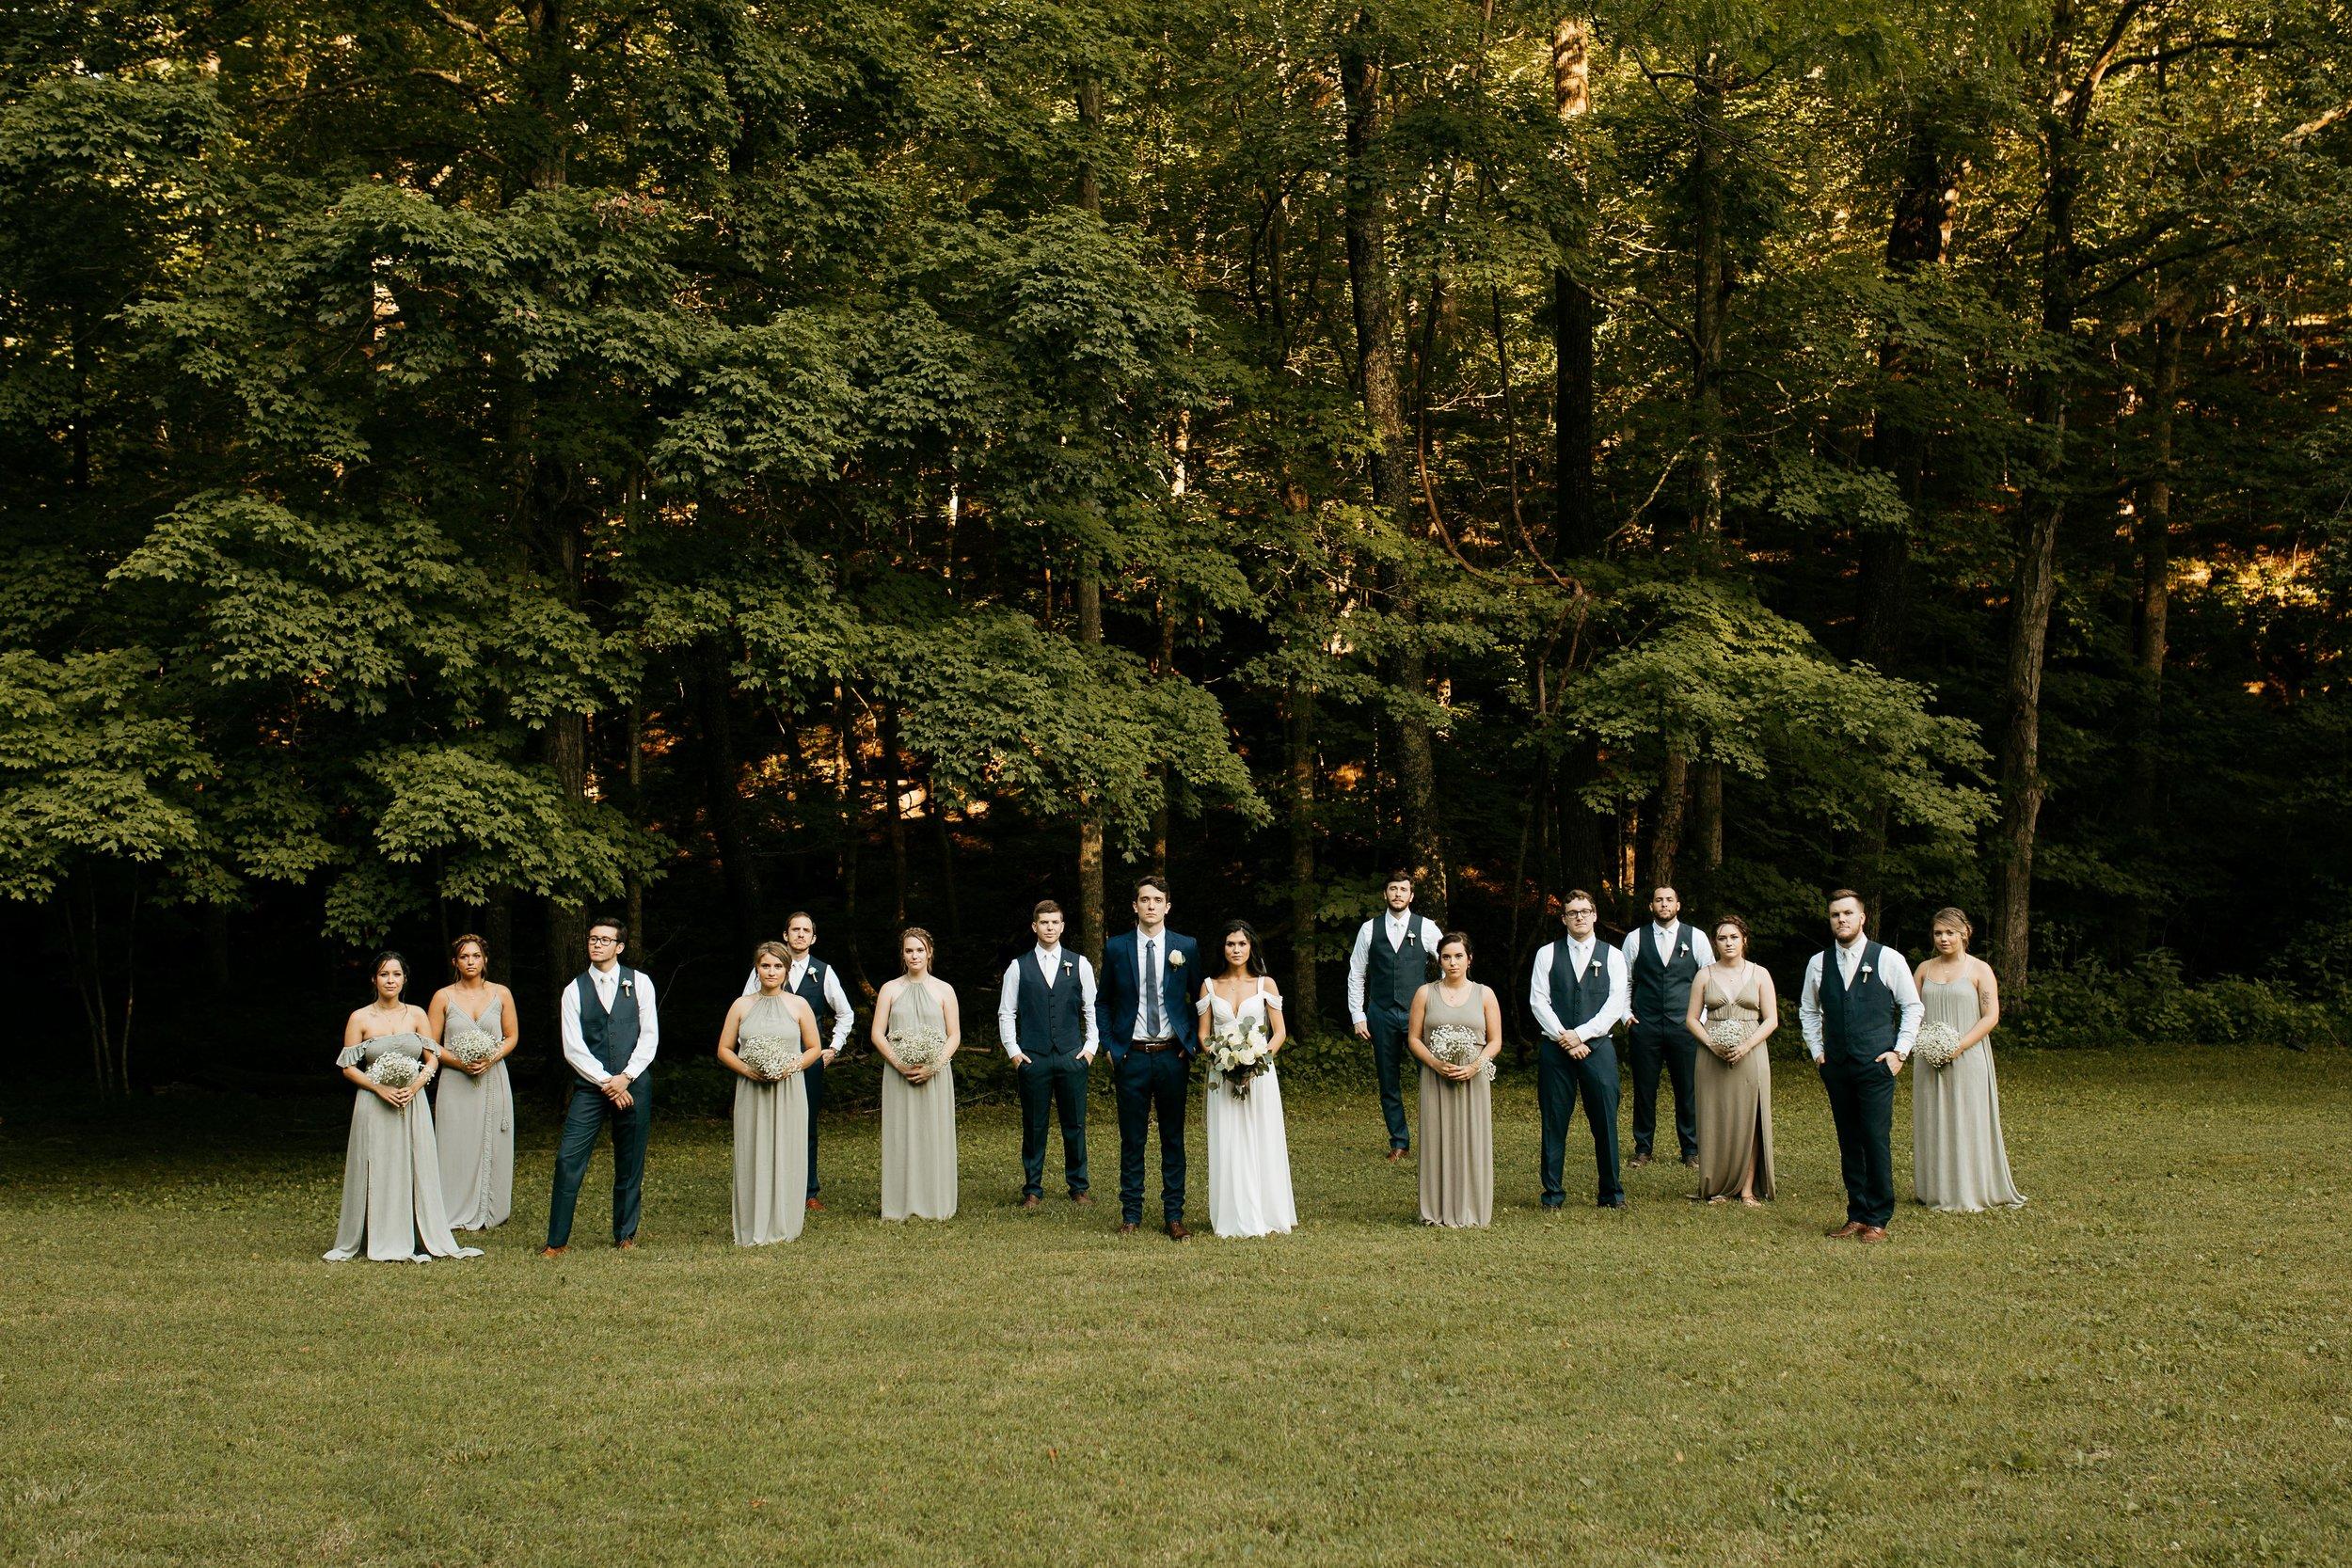 memphis tn wedding-116.jpg